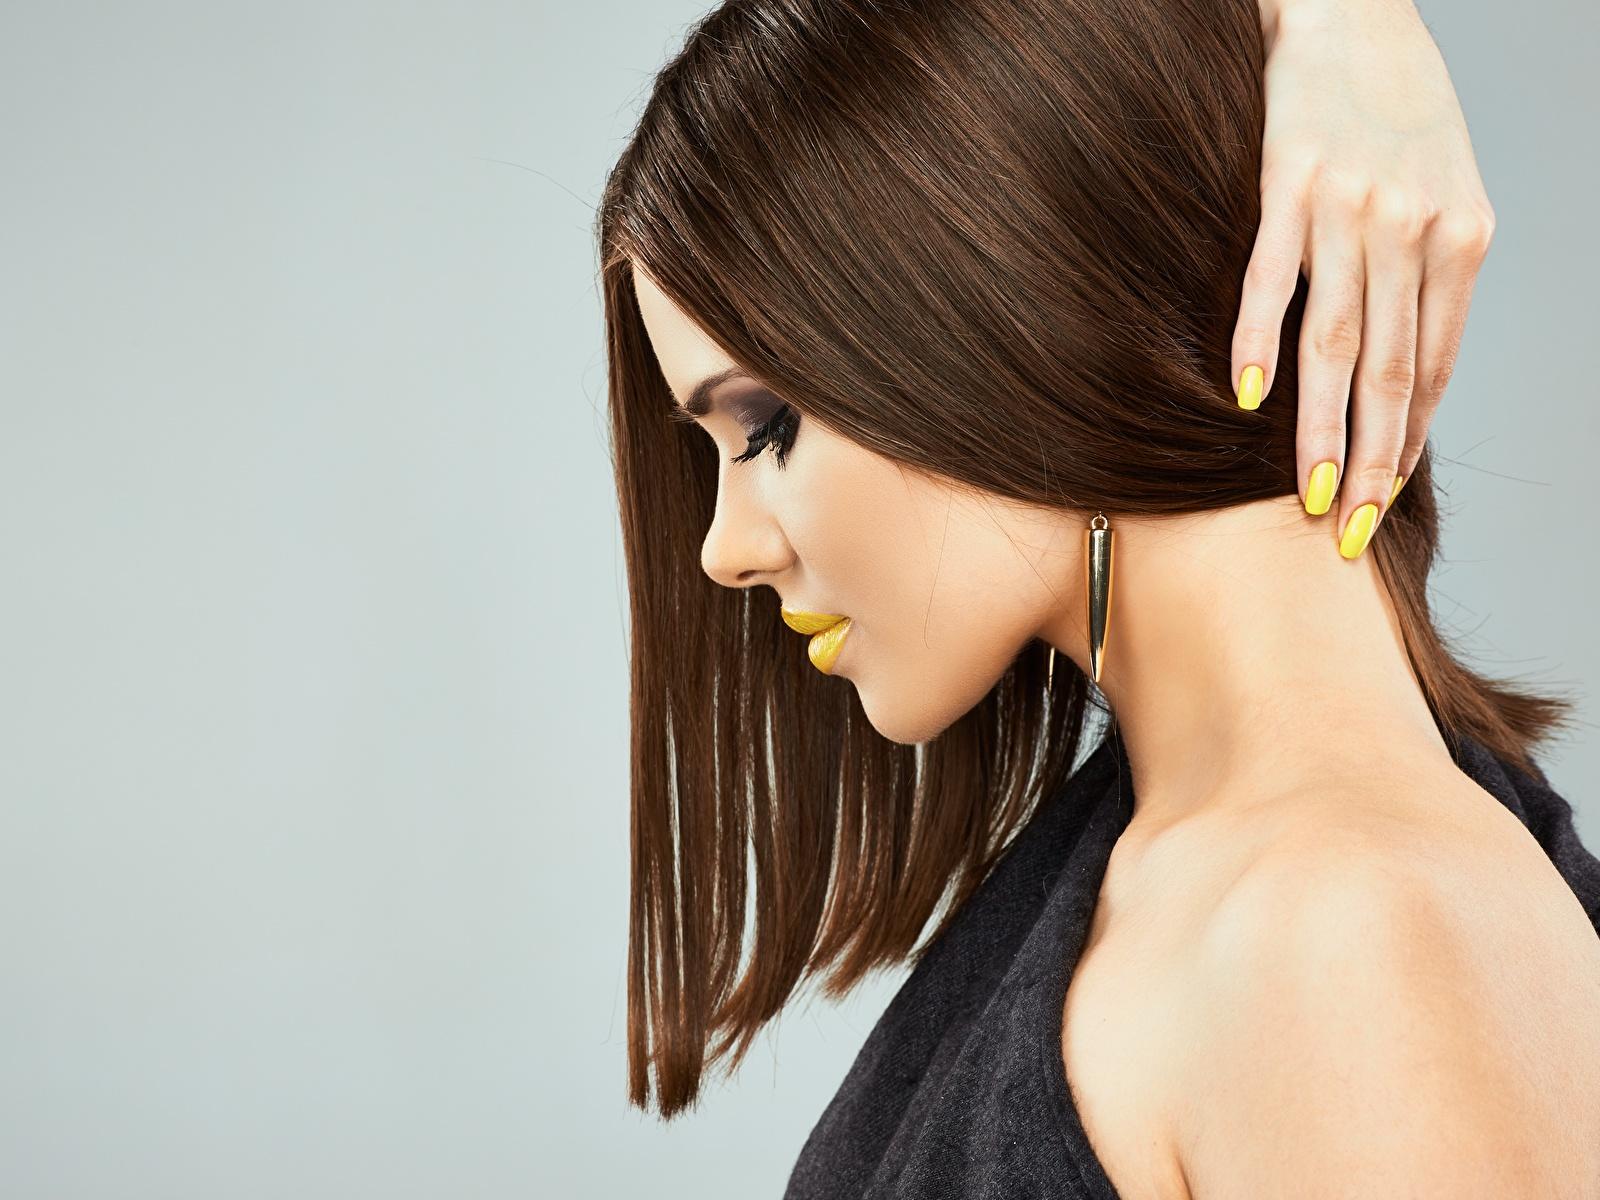 Foto Model Maniküre Make Up Frisur Haar junge frau Finger Seitlich 1600x1200 Schminke Frisuren Mädchens junge Frauen